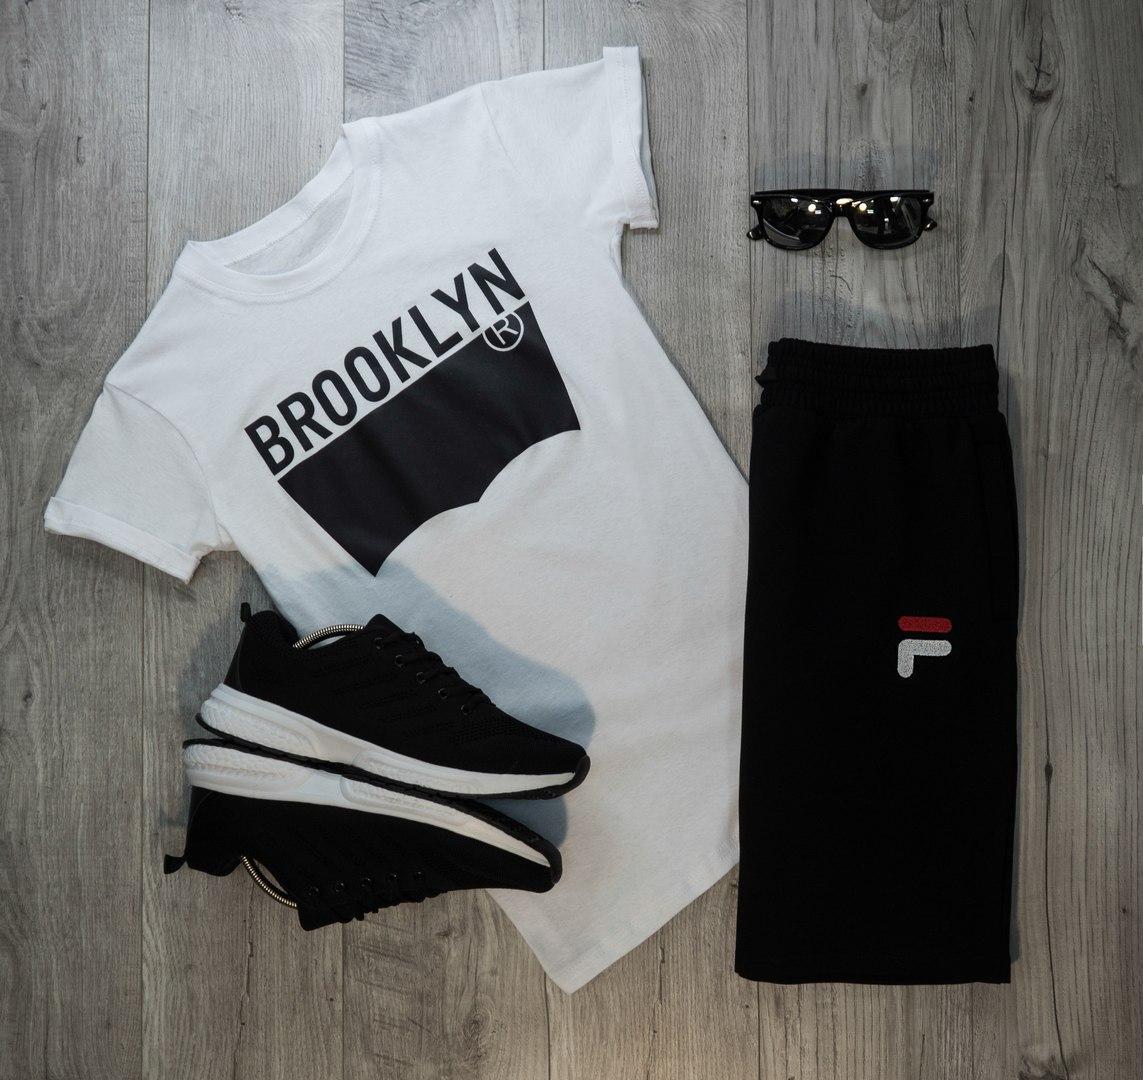 Мужская футболка в стиле Levi's белая (M, L, XL размеры)